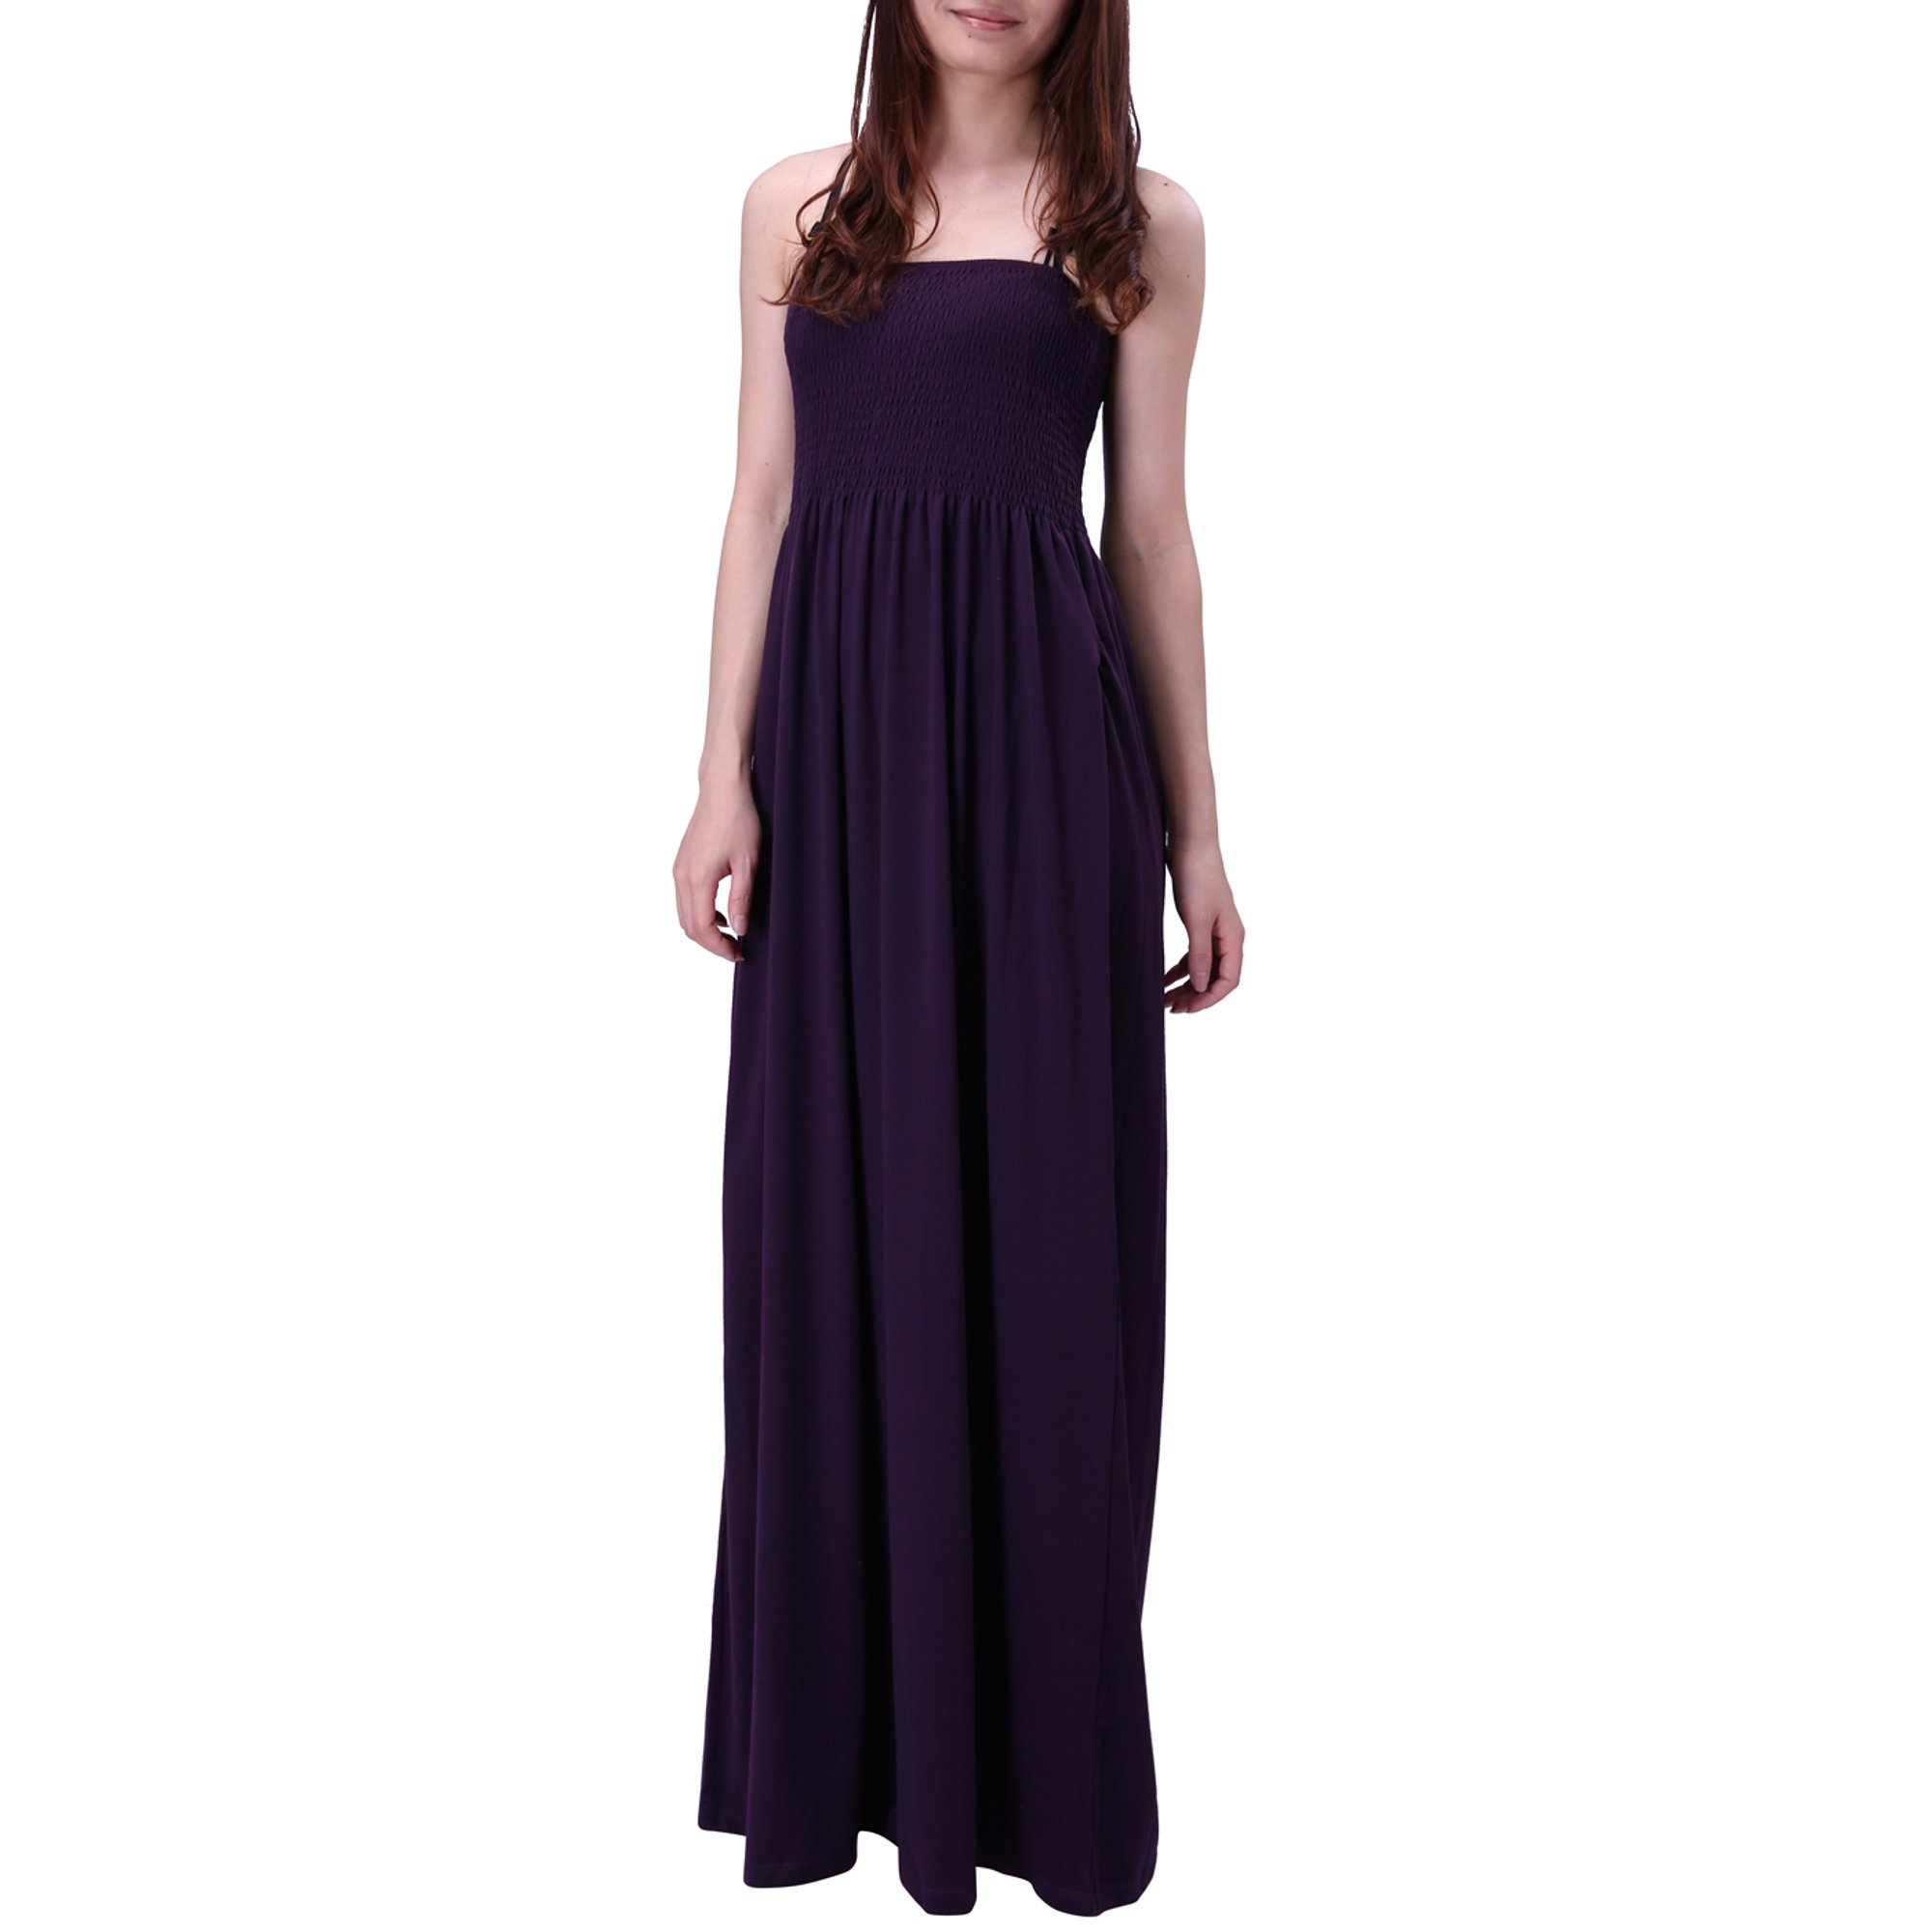 288c6fbcea HDE Women's Strapless Maxi Dress Plus Size Tube Top Long Skirt Sundress  Cover up (Blue Floral, Large)